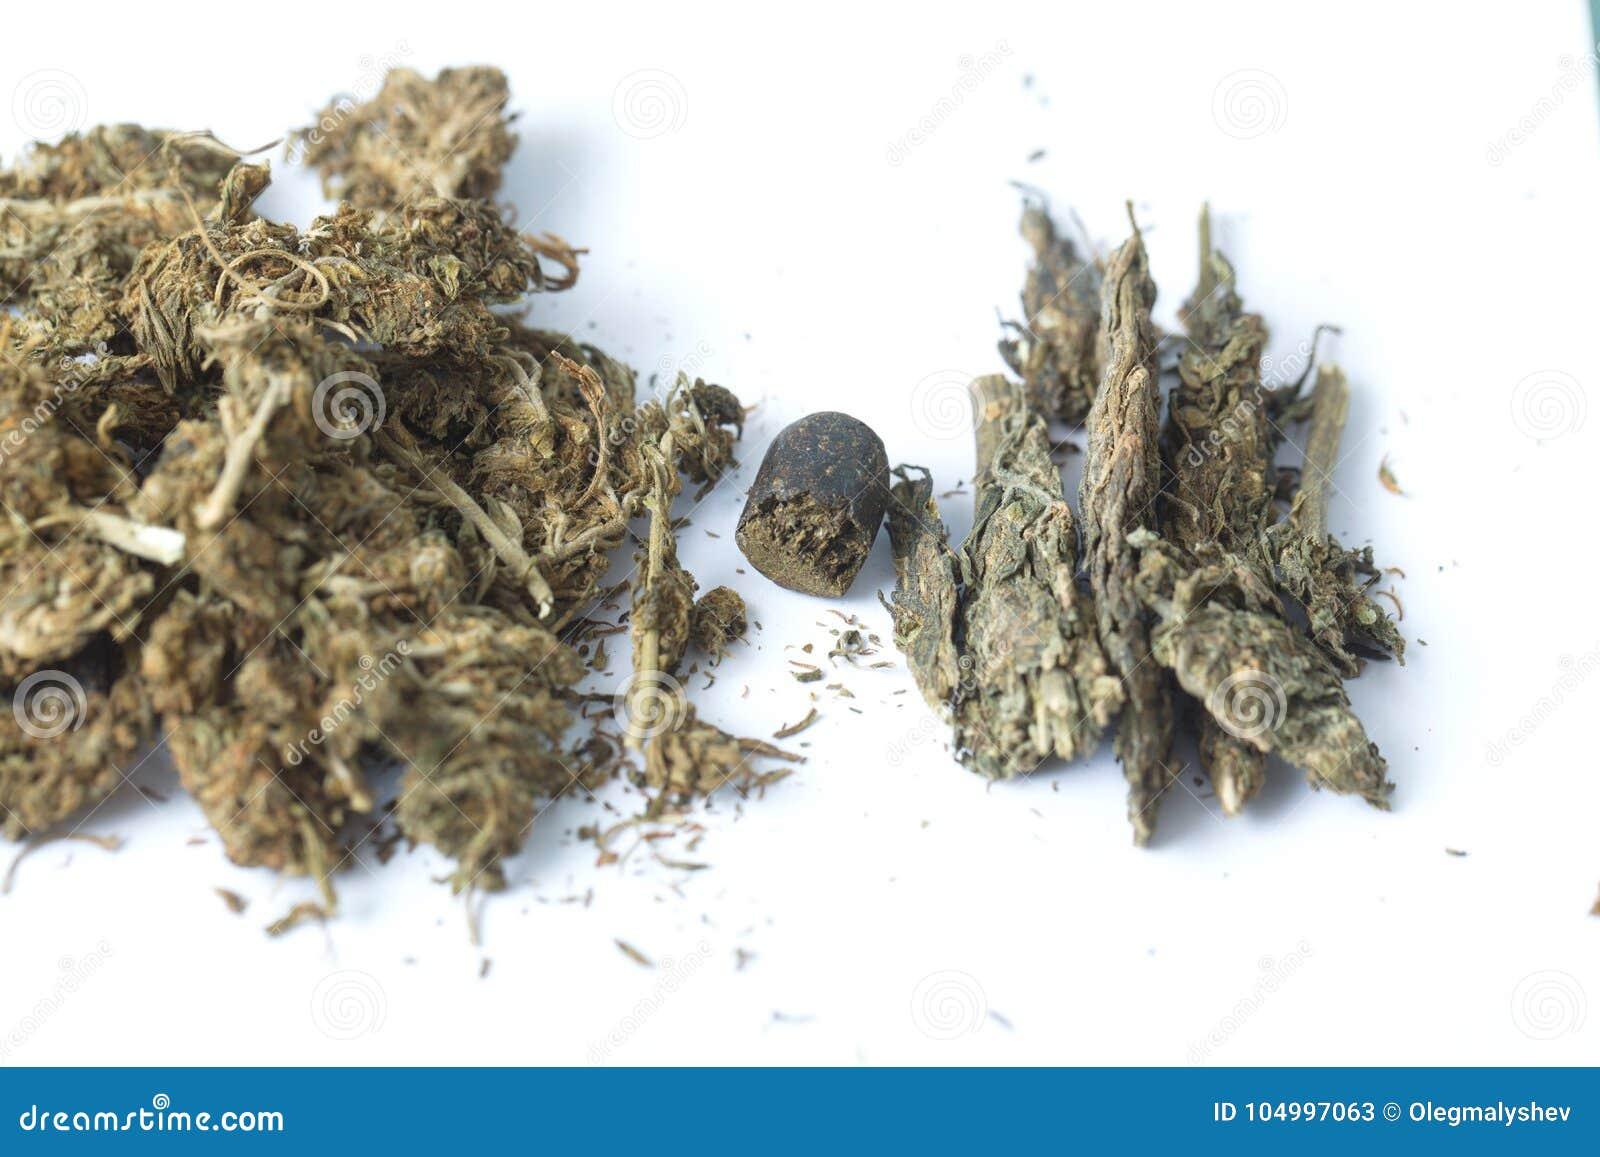 Семена конопли индийская кузьмич с конопли